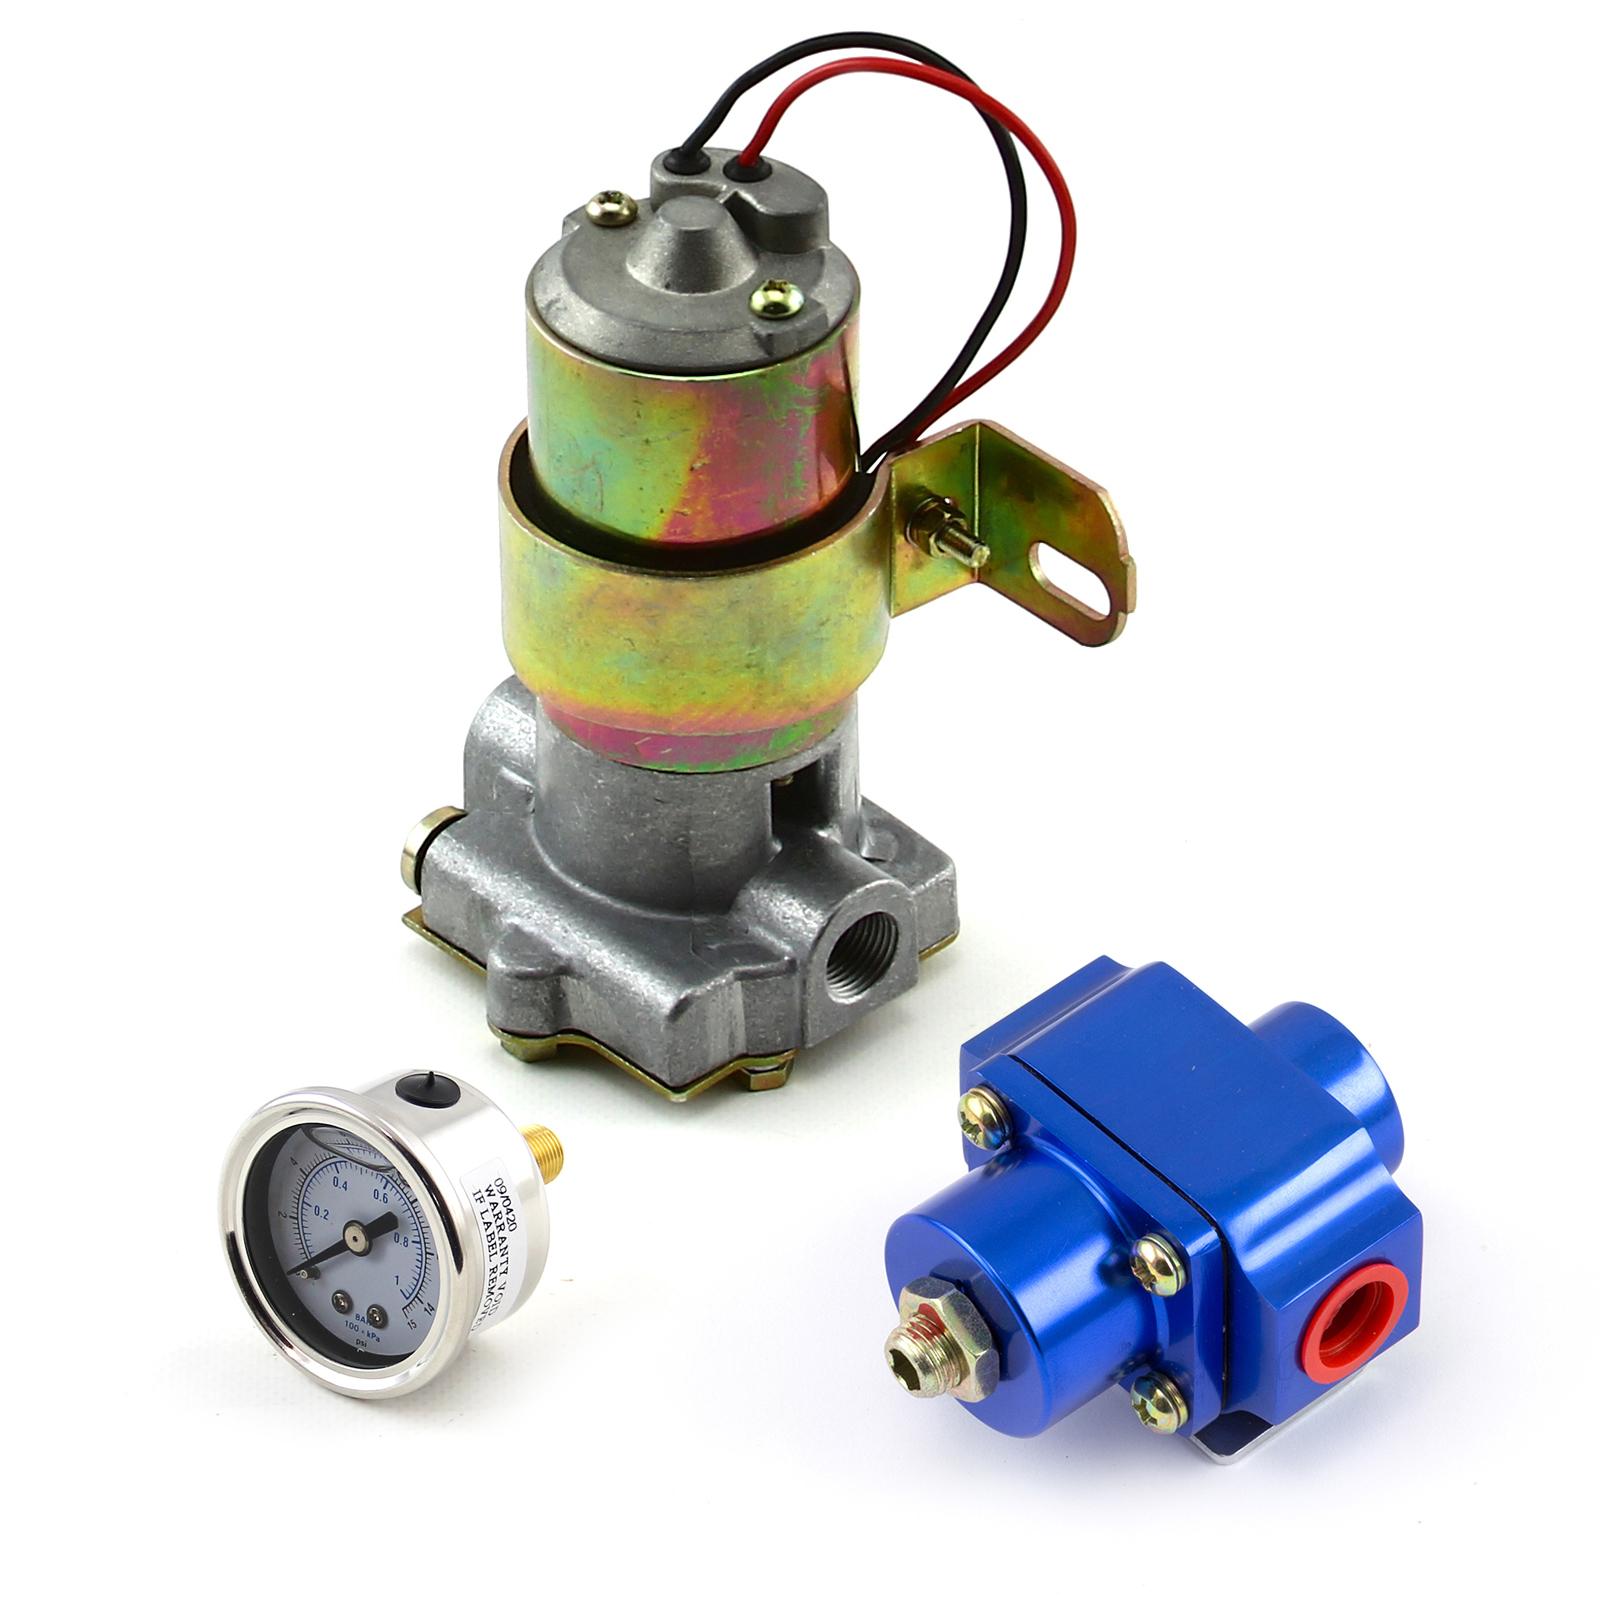 140 Gph Universal Electric Fuel Pump w/ Blue Regulator & Gauge Combo Kit